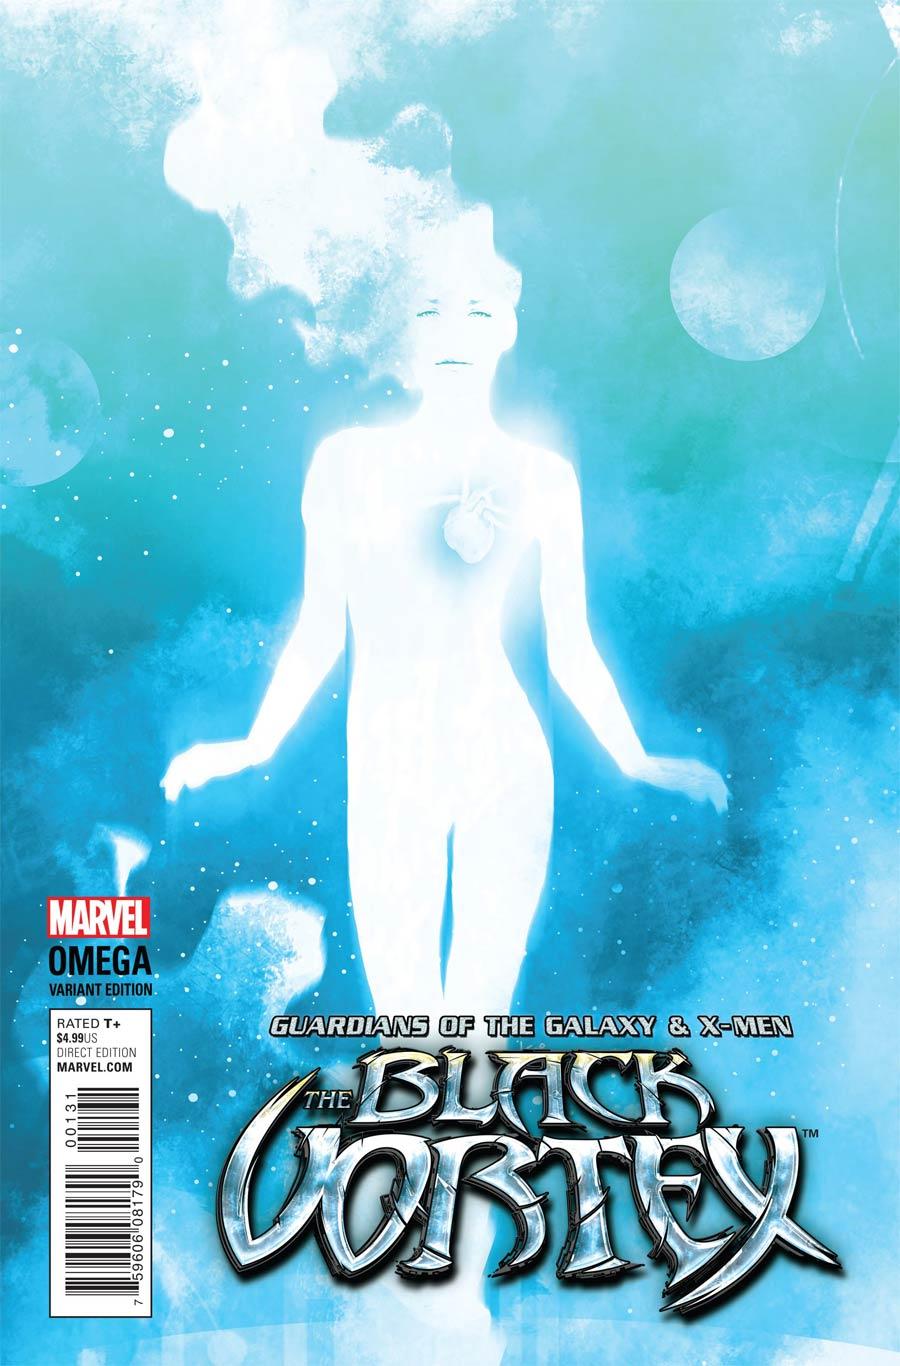 Guardians Of The Galaxy & X-Men Black Vortex Omega #1 Cover C Incentive Andrea Sorrentino Cosmically Enhanced Variant Cover (Black Vortex Part 13)